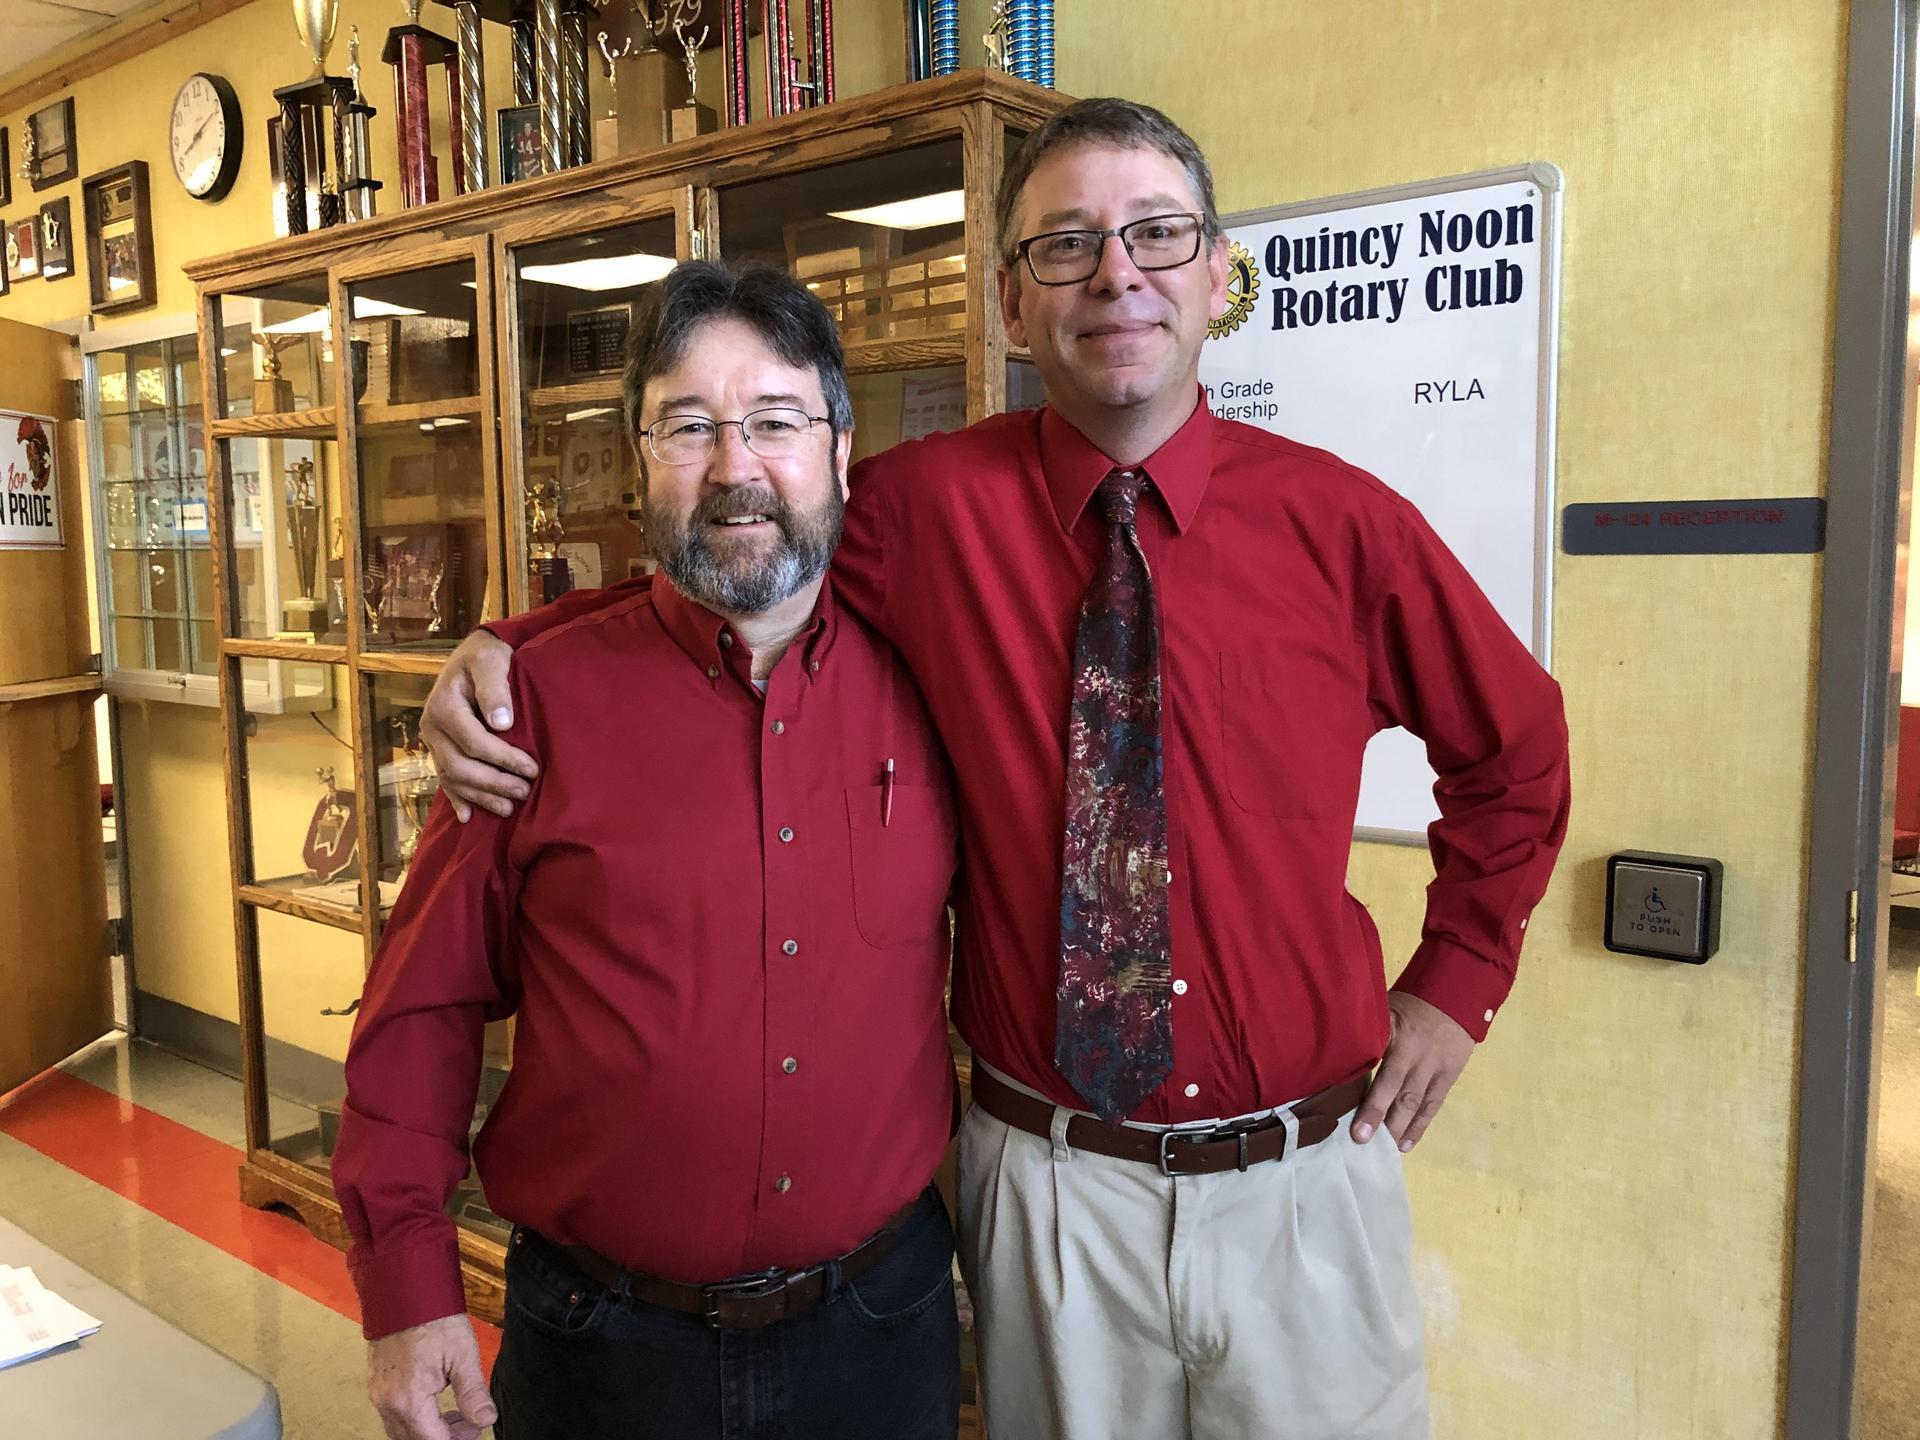 Mr. Hintz and Mr. McMorrow